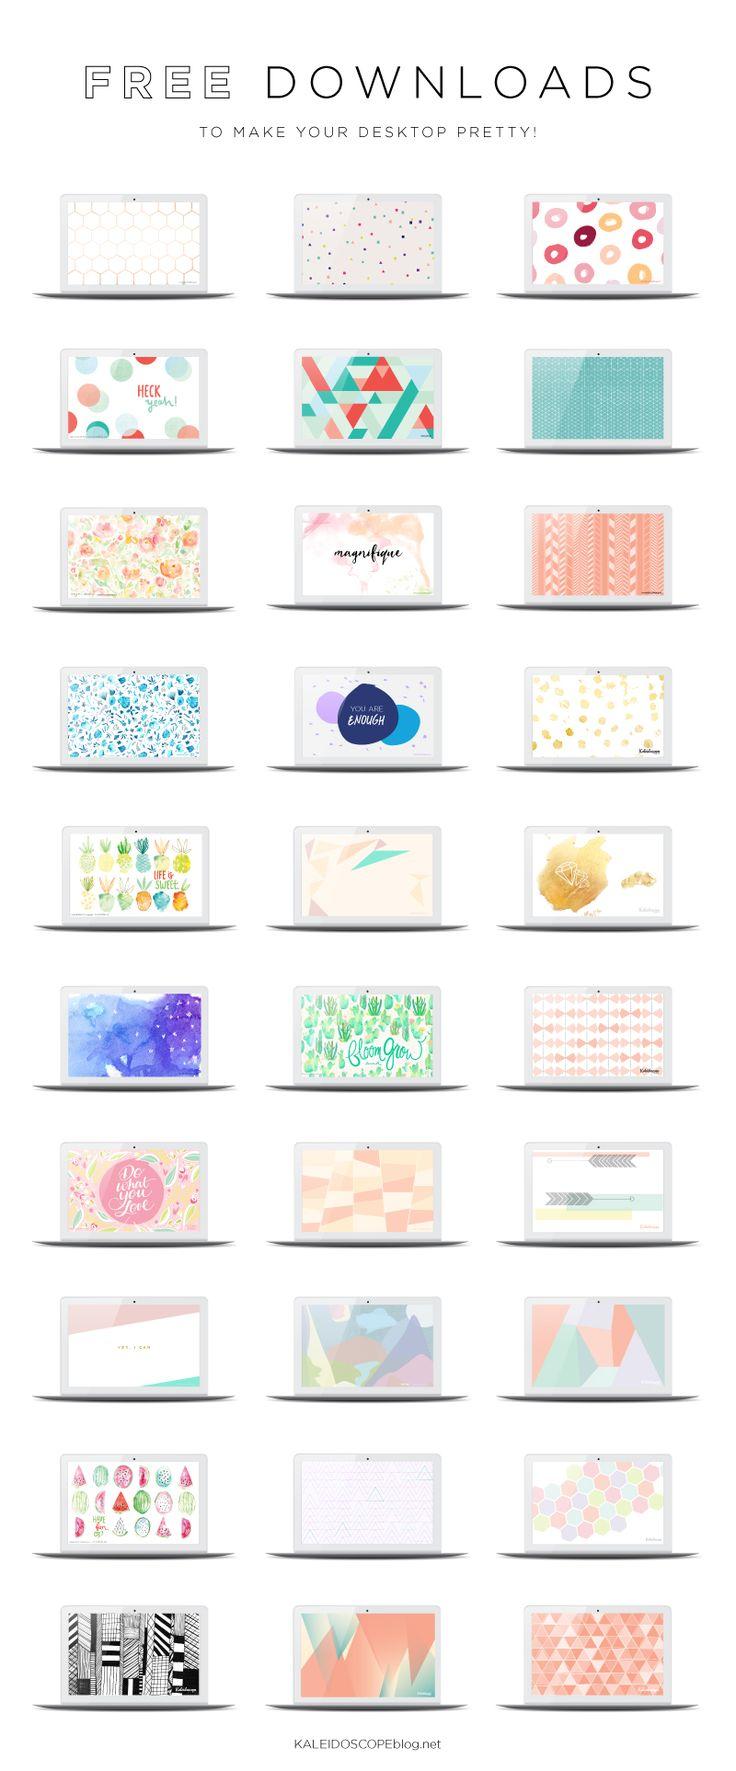 Loads of free wallpaper designs to dress up your computer's desktop from kaleidoscopeblog.net